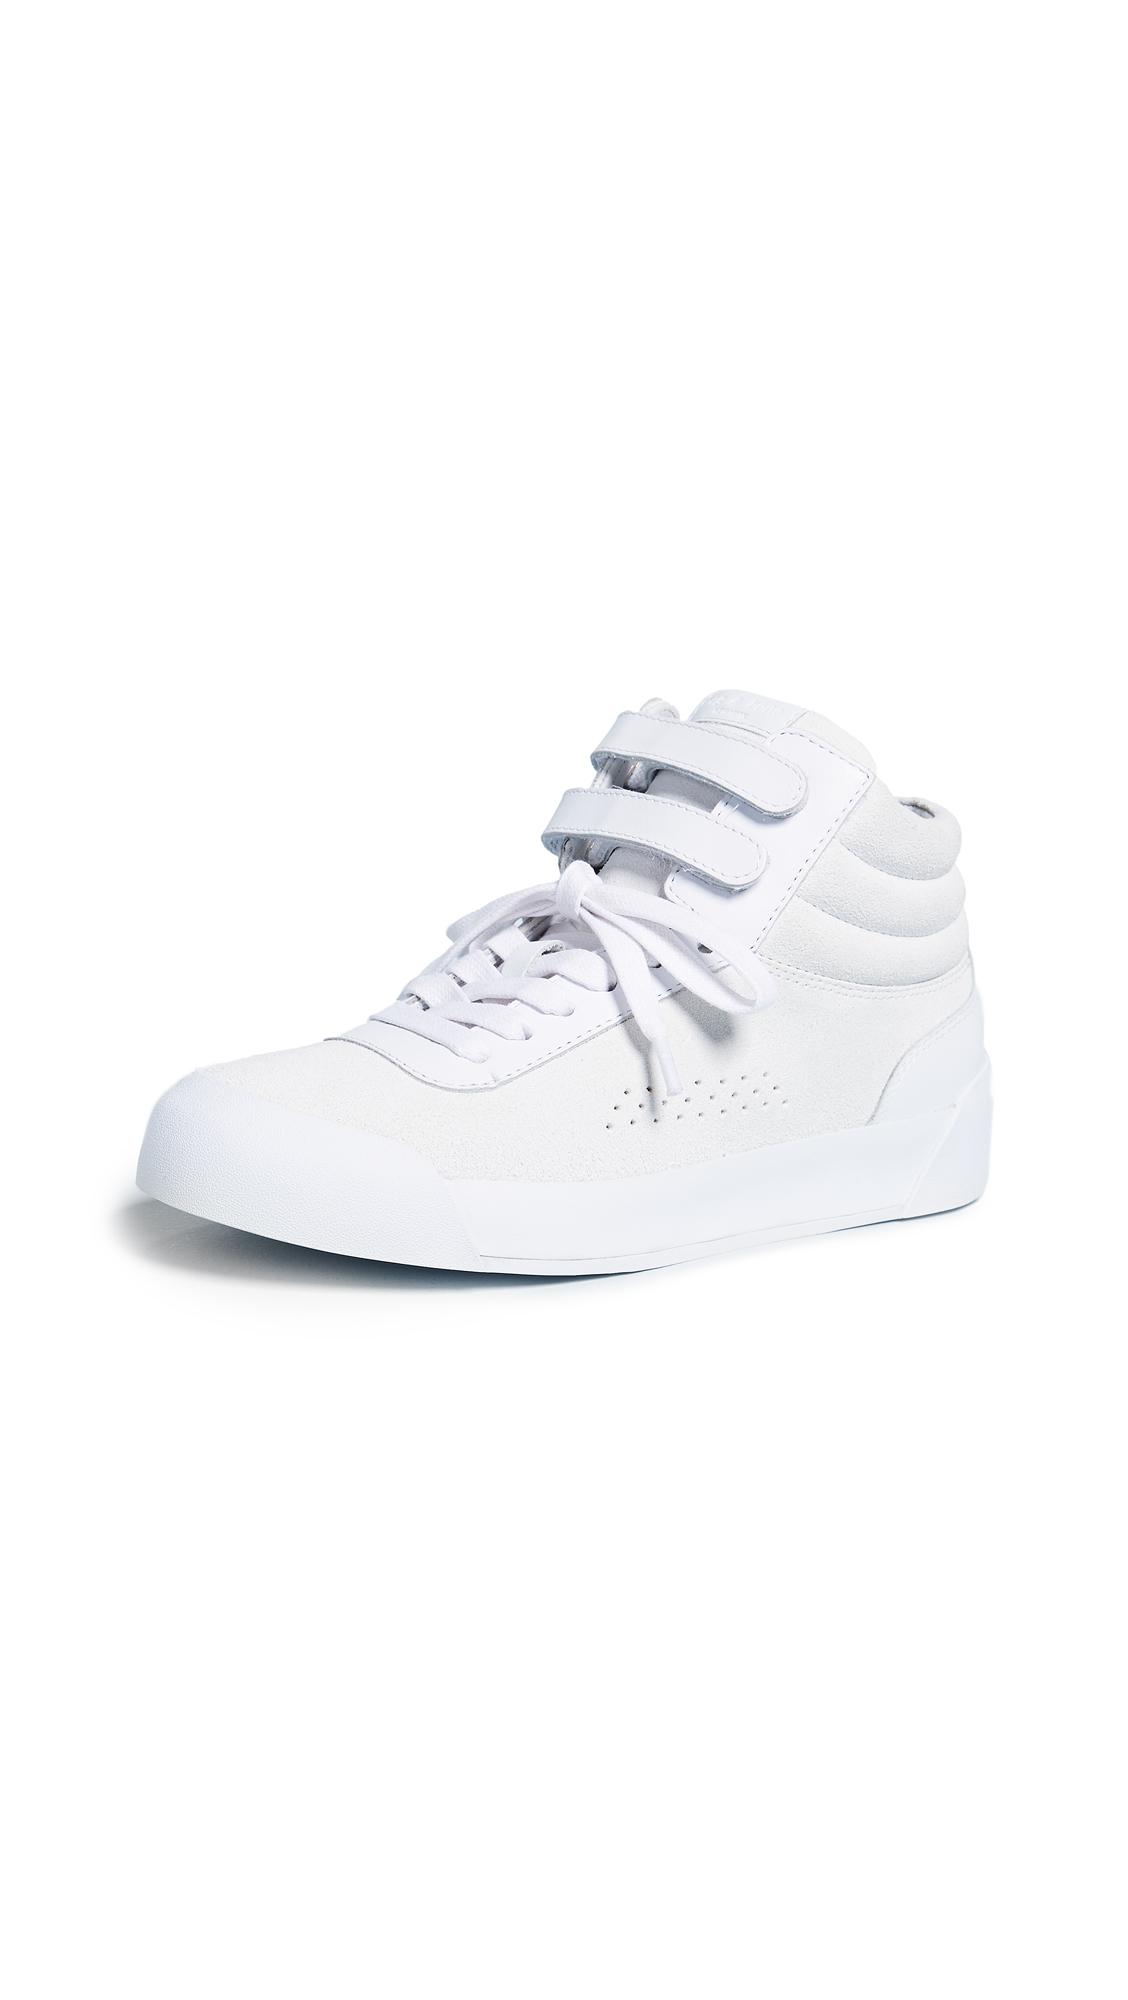 Rag & Bone Nova Sneakers - White